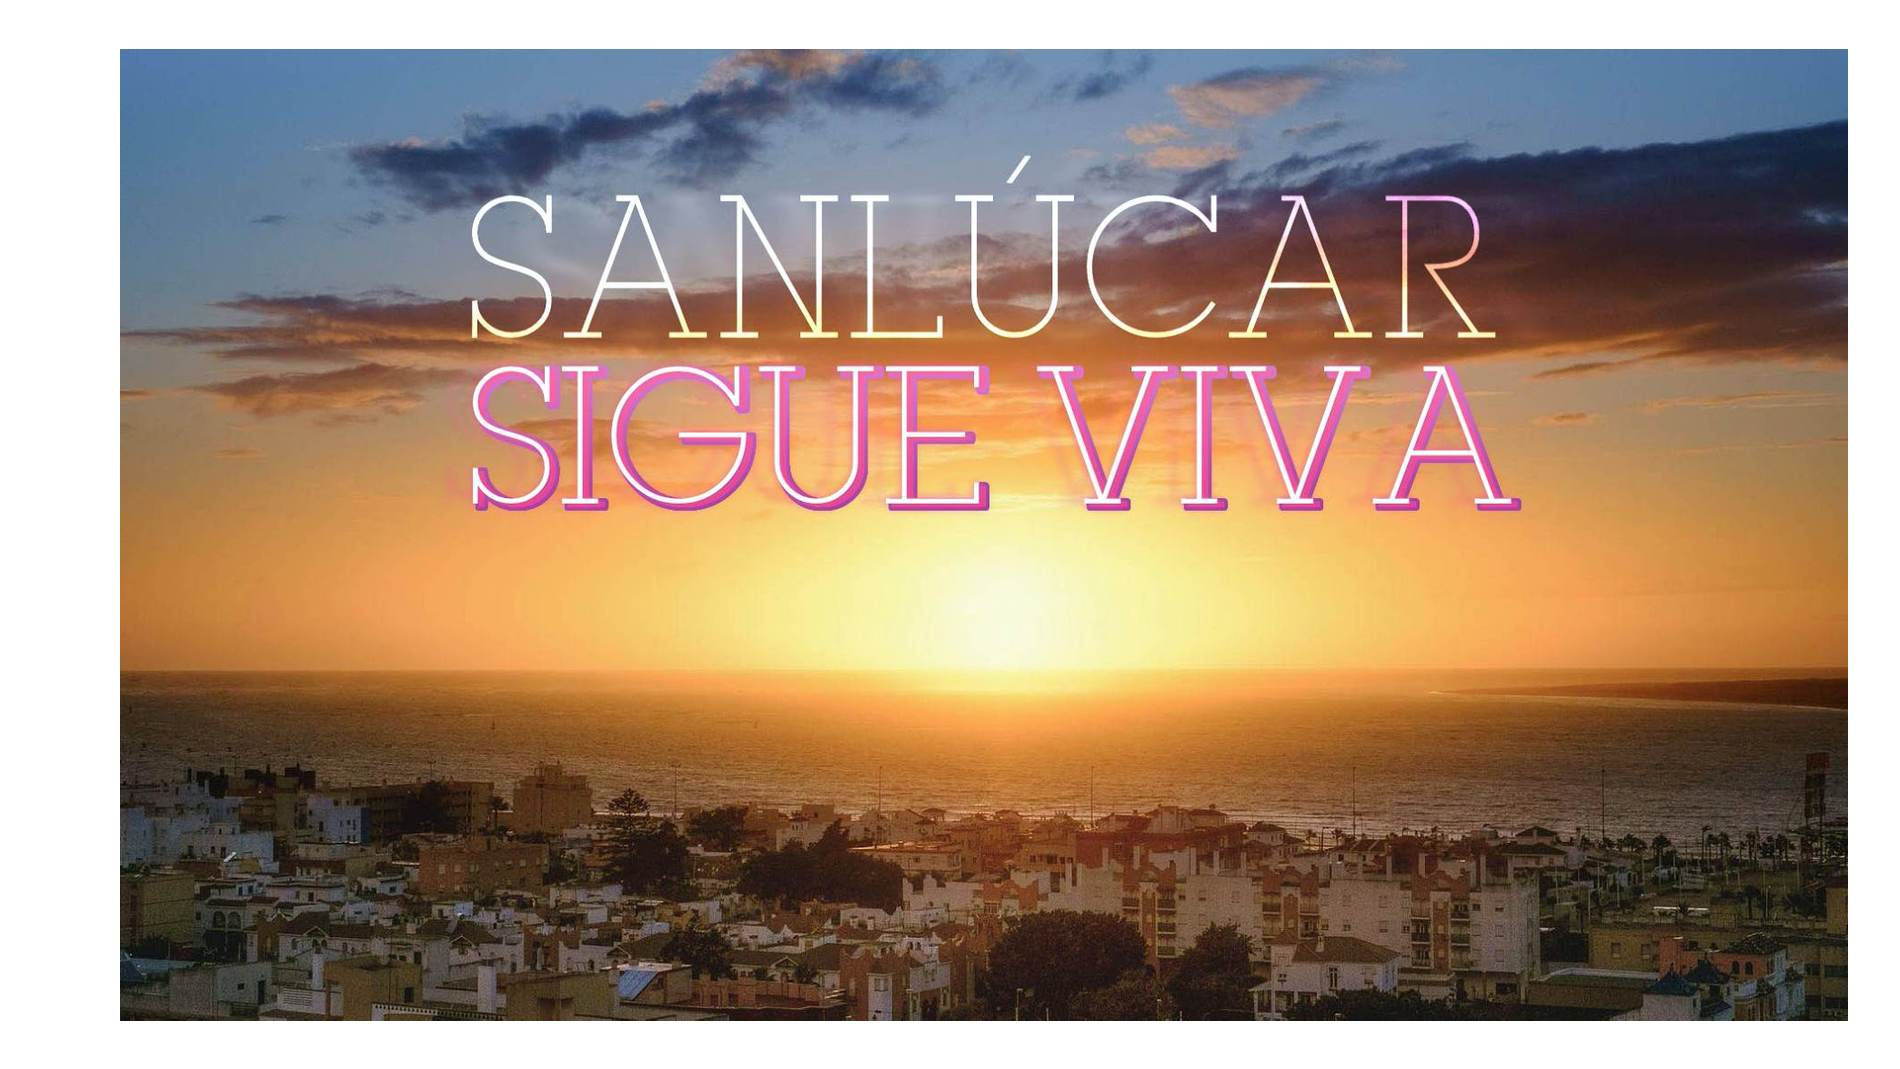 Sanlúcar lebt noch